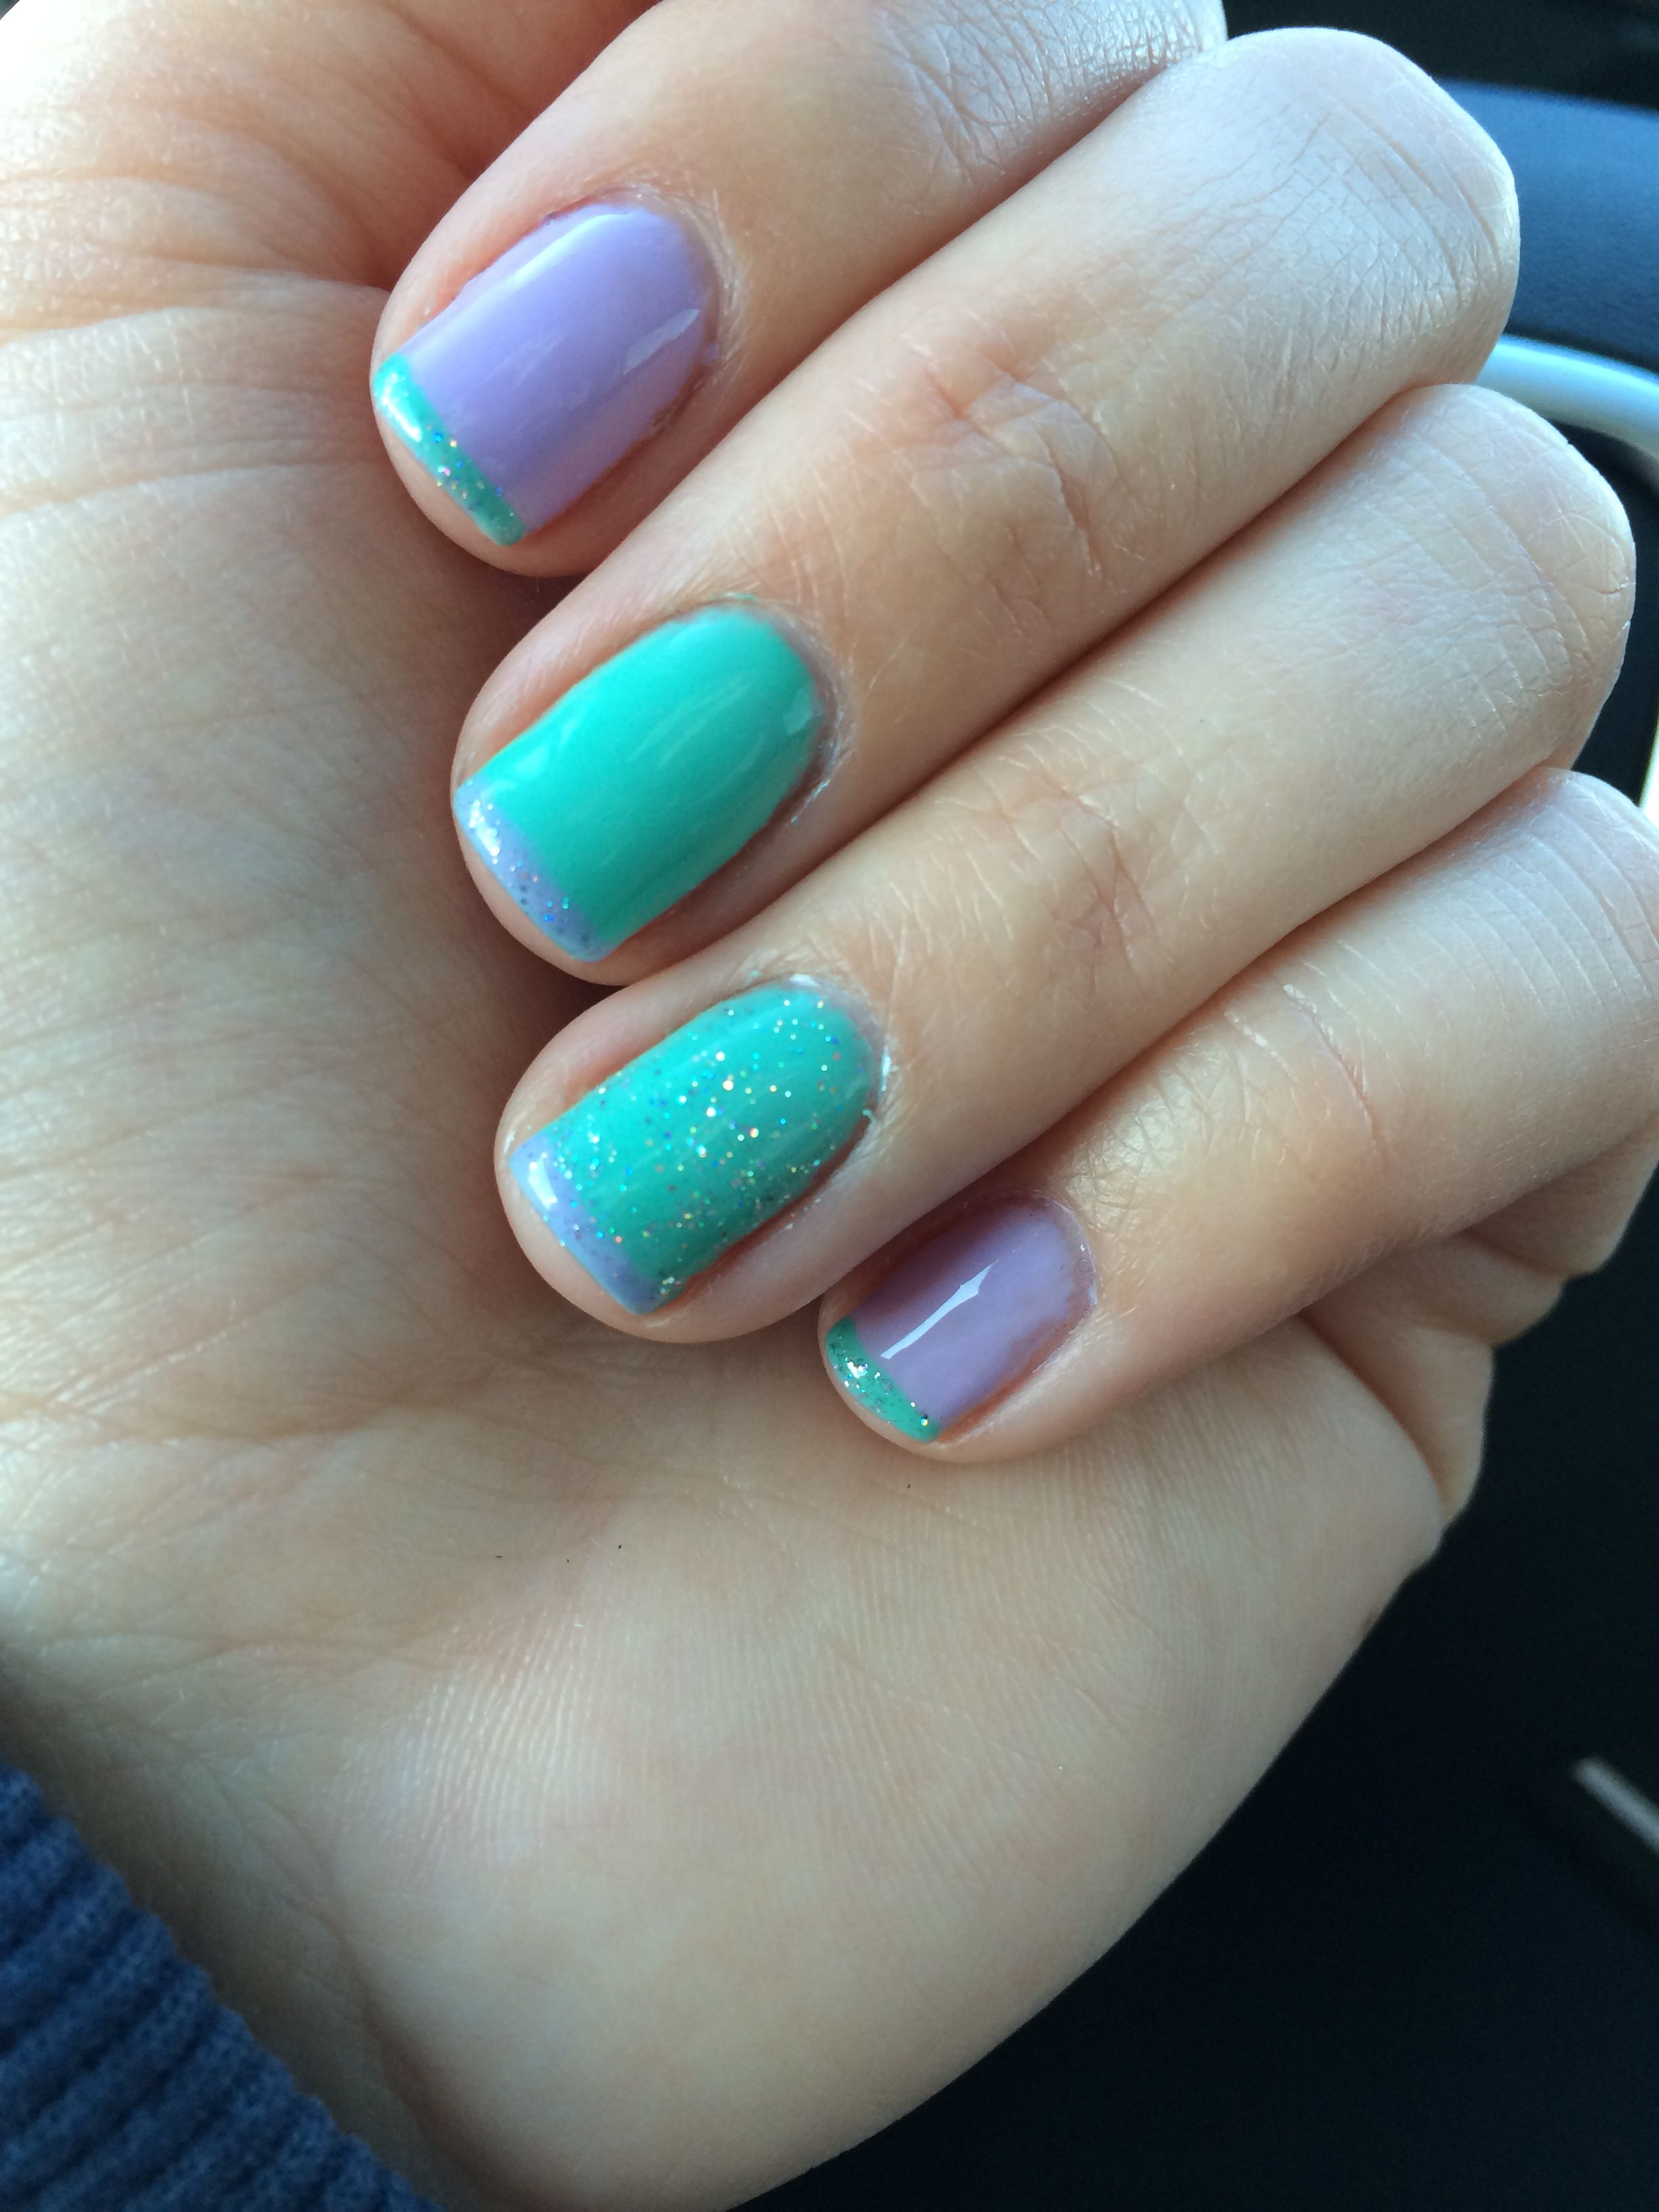 Spring gel nails. Gel manicure. | nails | Pinterest | Uñas lindas ...